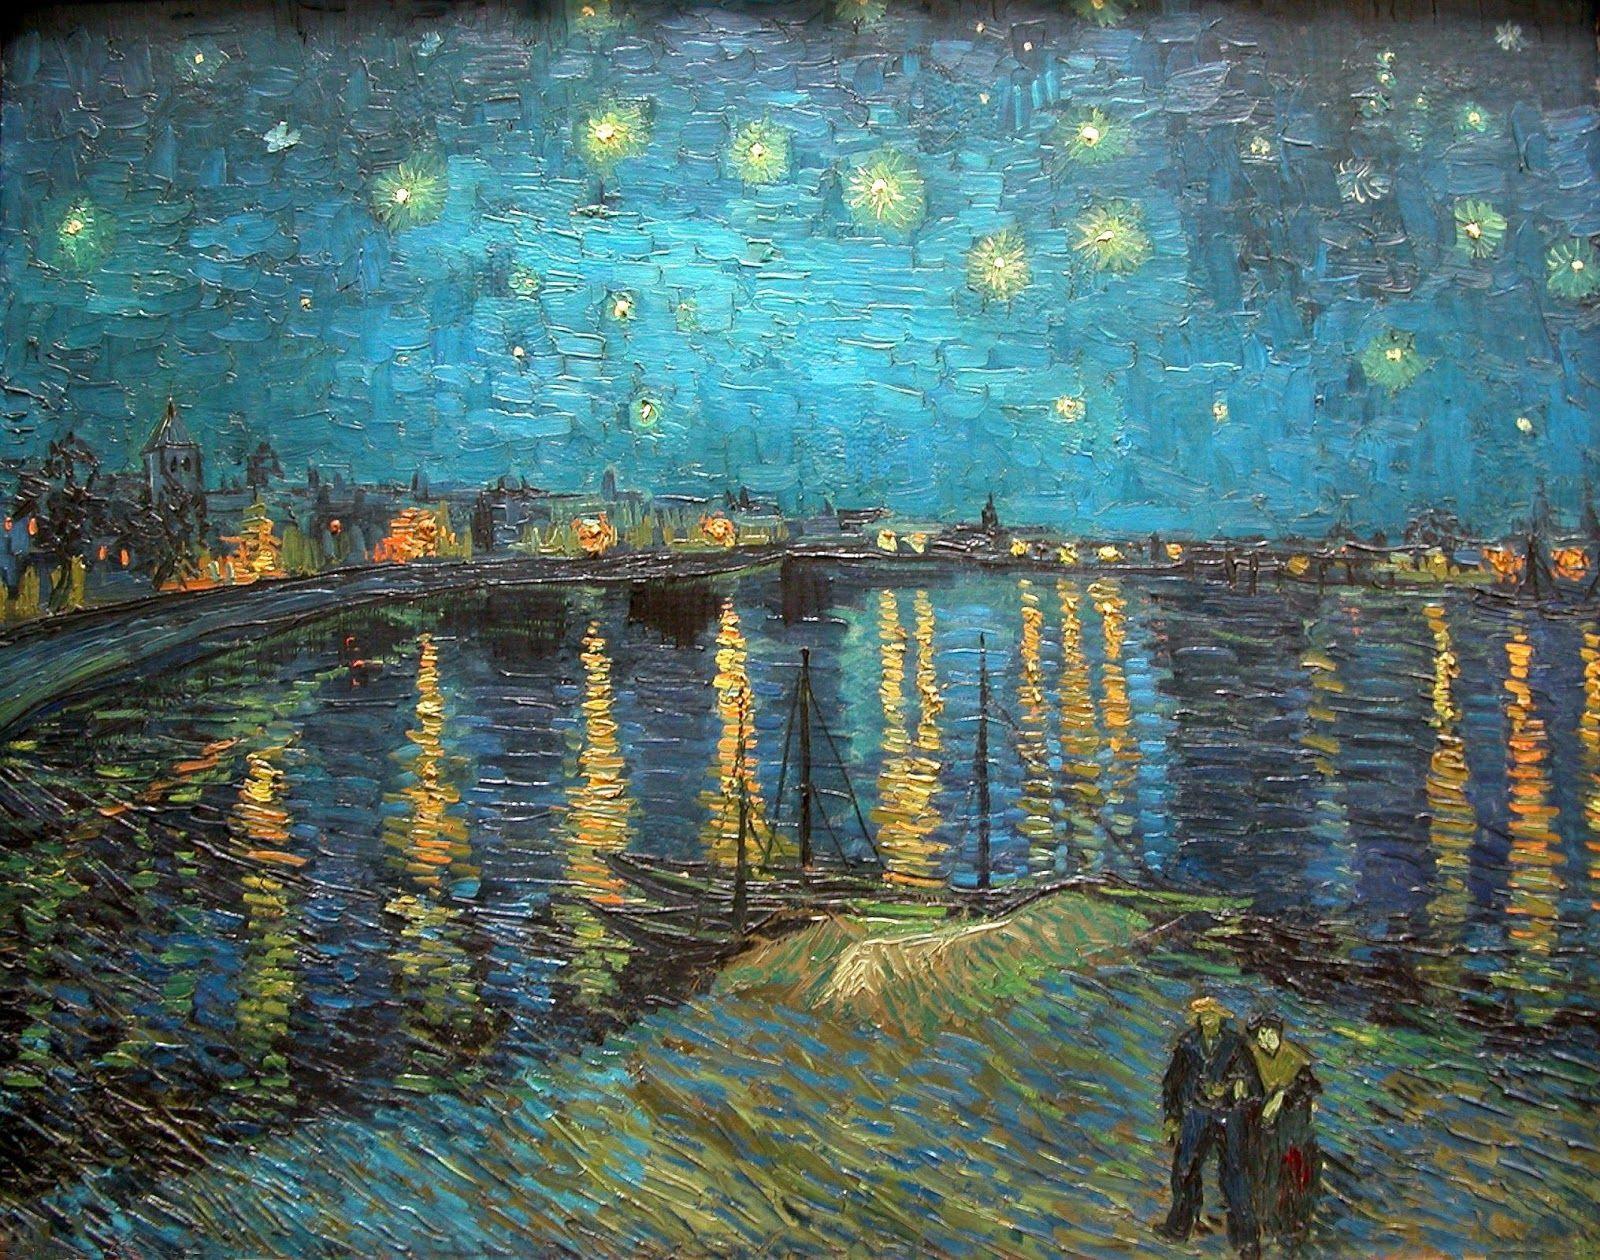 Vincent Van Gogh Starry Night Wallpaper Sf Wallpaper